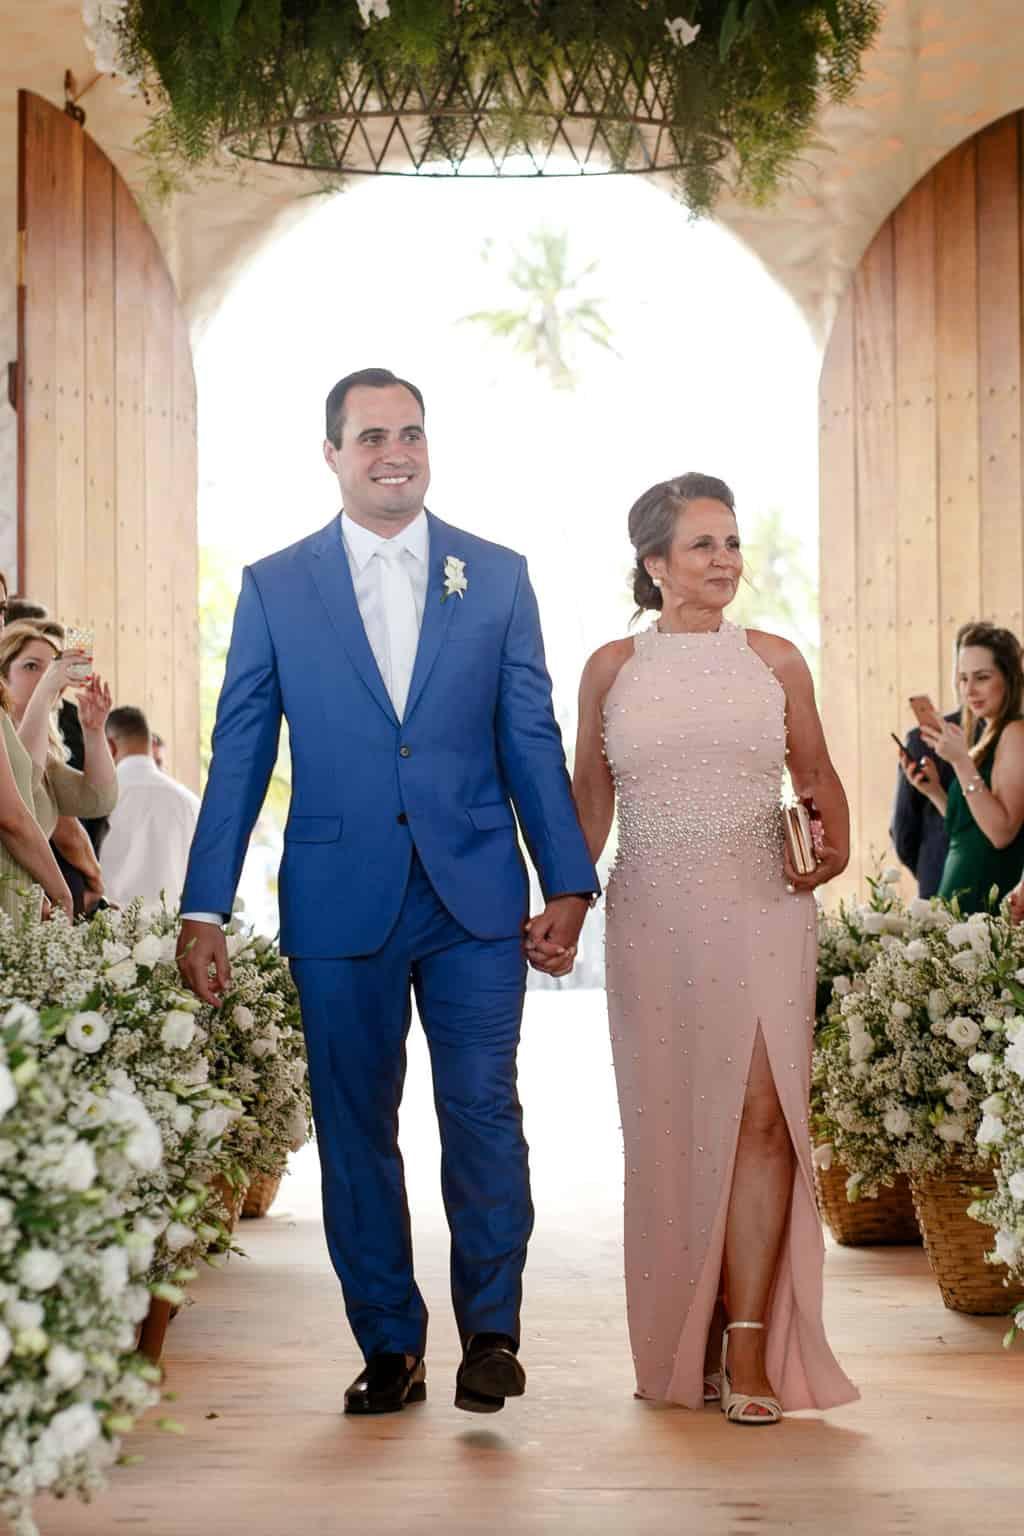 AL-Aline-e-Mauricio-capela-dos-milagres-casamento-casamento-na-praia-mae-da-noiva-pai-do-noivo71